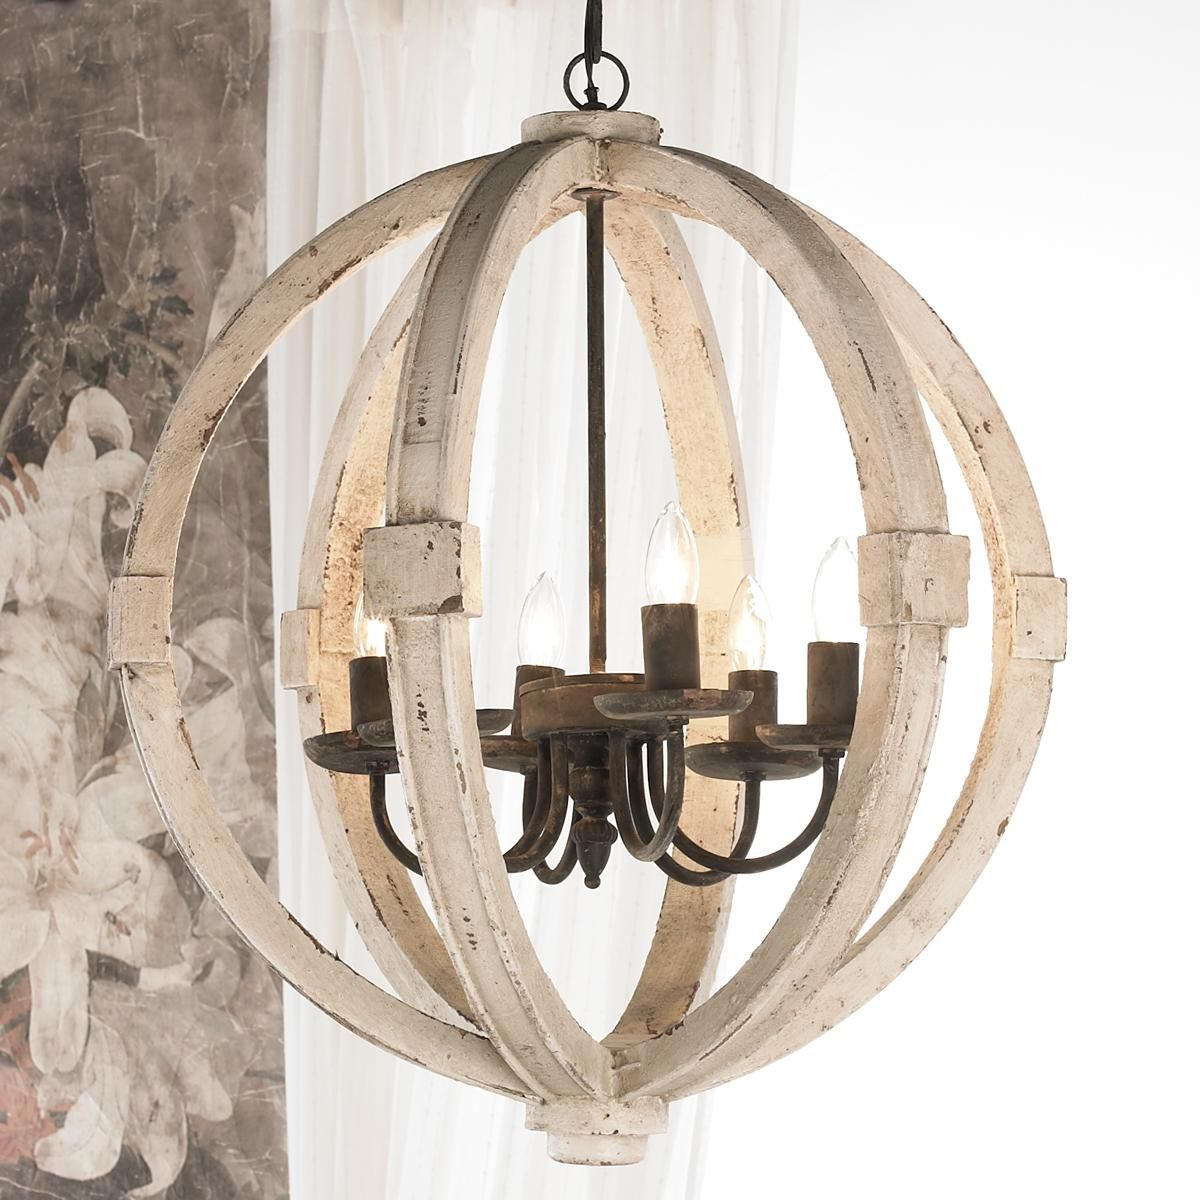 Distressed Wood Sphere Chandelier Rustic Chandelier Wooden